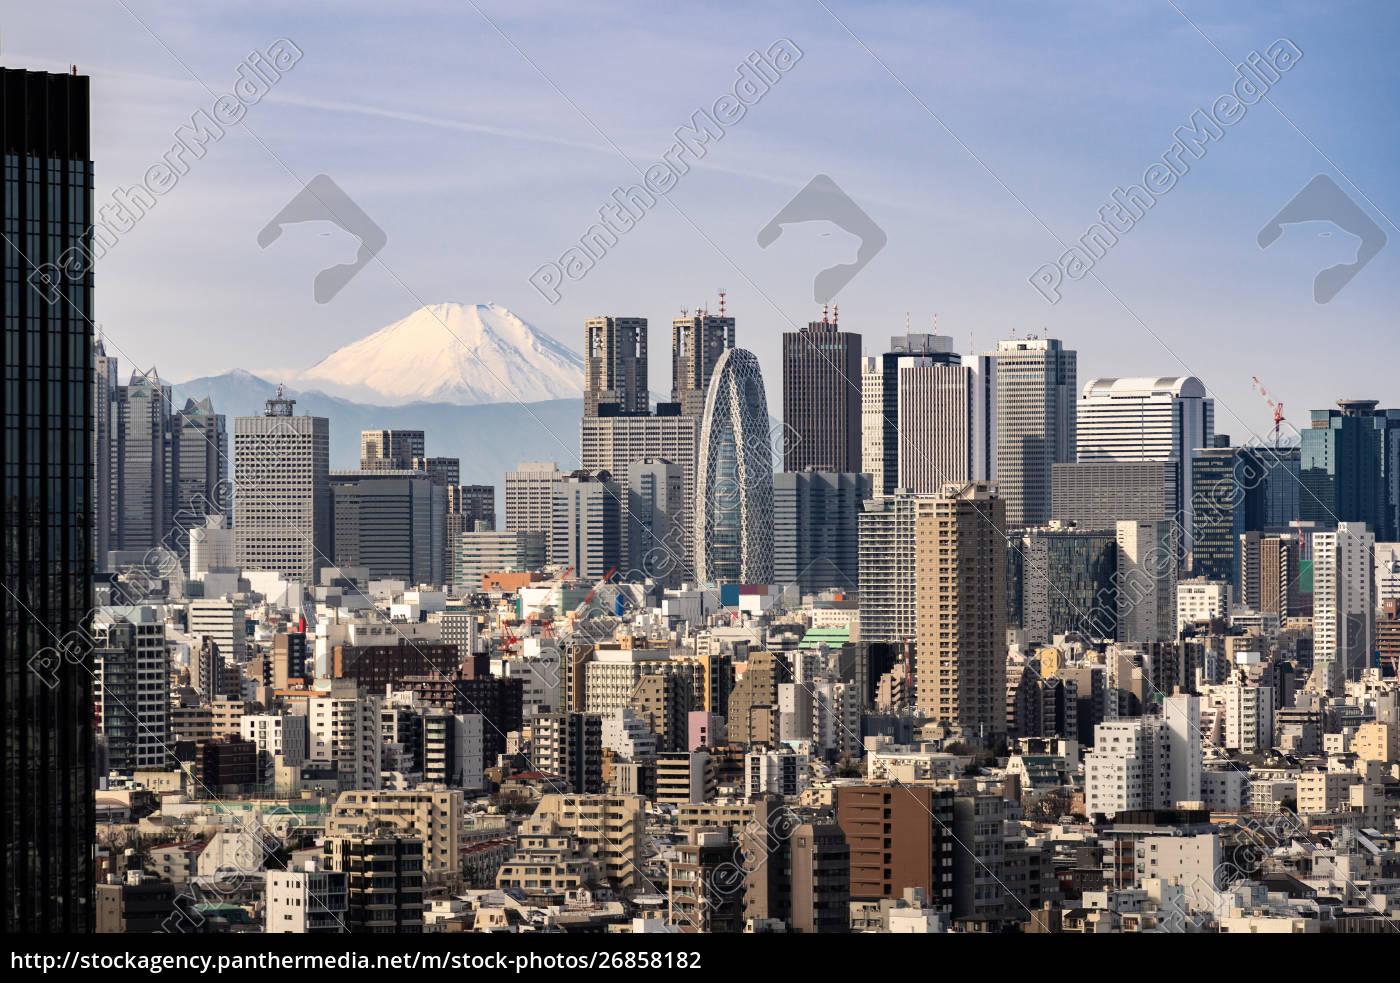 tokyo, skyline, and, mountain, fuji, in - 26858182